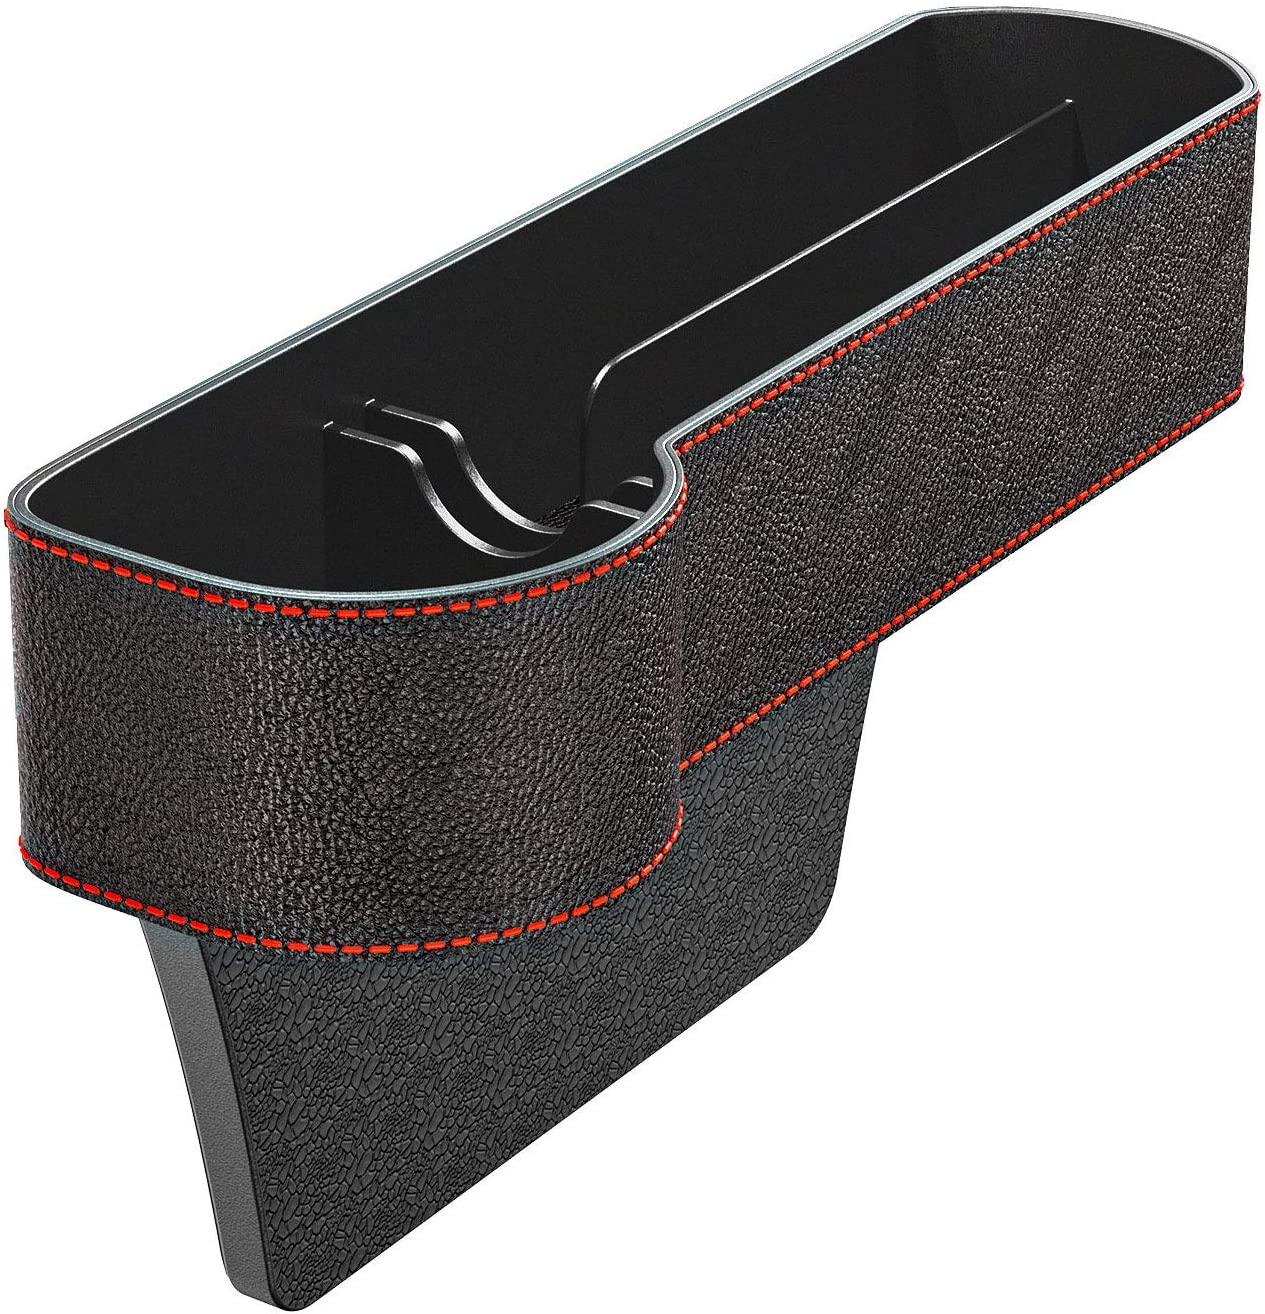 Car Seat Gap Organiser Side Gap Pocket PU Leather Car Tidy Organiser Front Seat Catcher Storage with Coin /& Cup Holder Car Organizer Storage Box L Universal Seat Storage Gap Filler